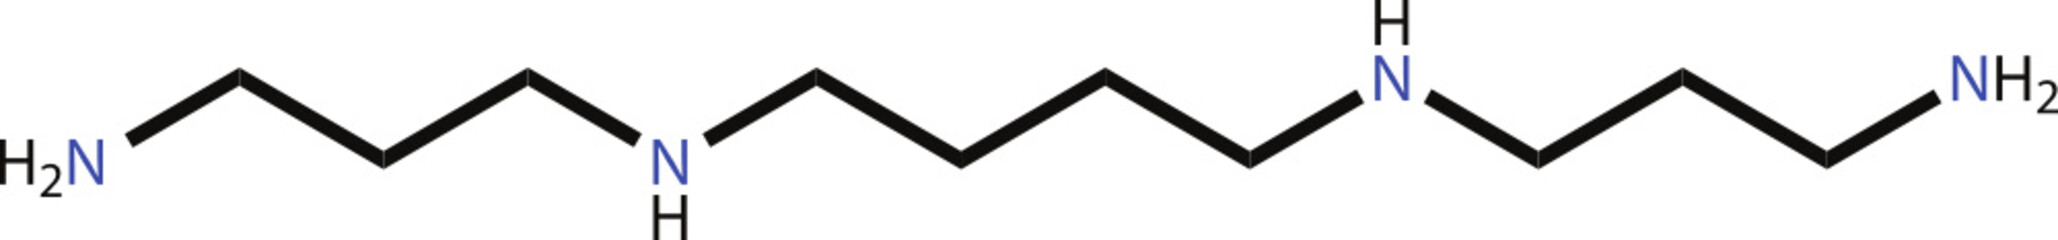 Spermine structural formula